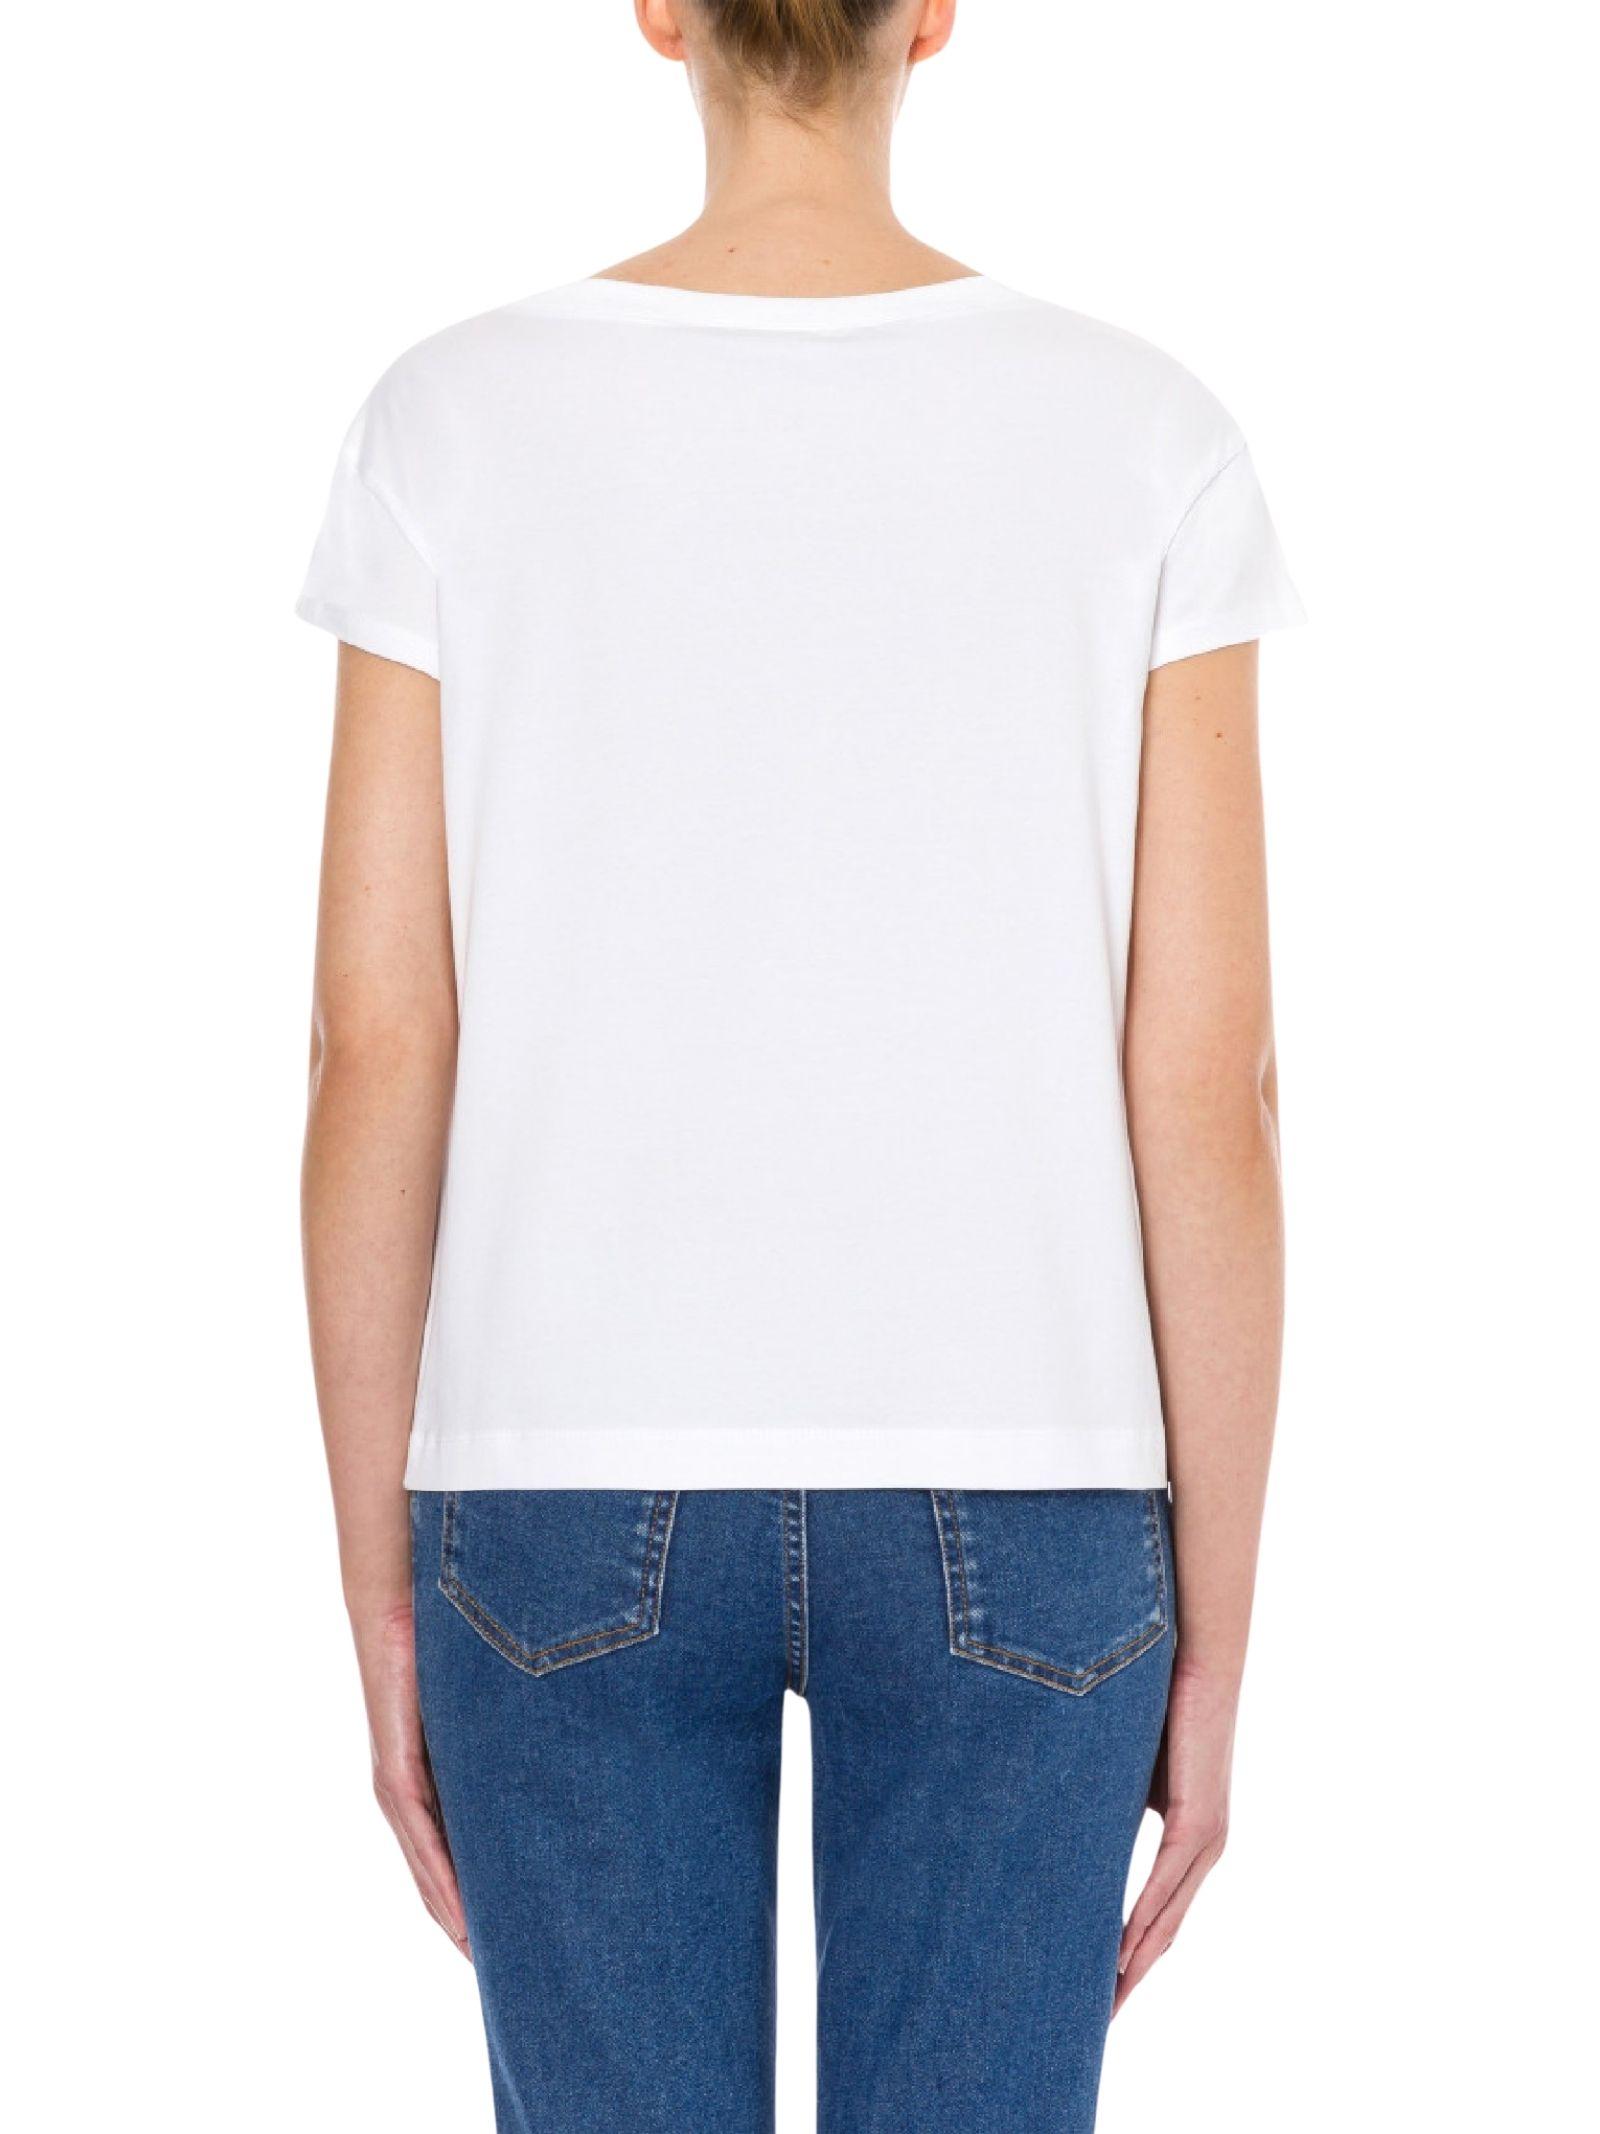 MOSCHINO LOVE | T-shirt | W 4 F30 2L E 1951A00